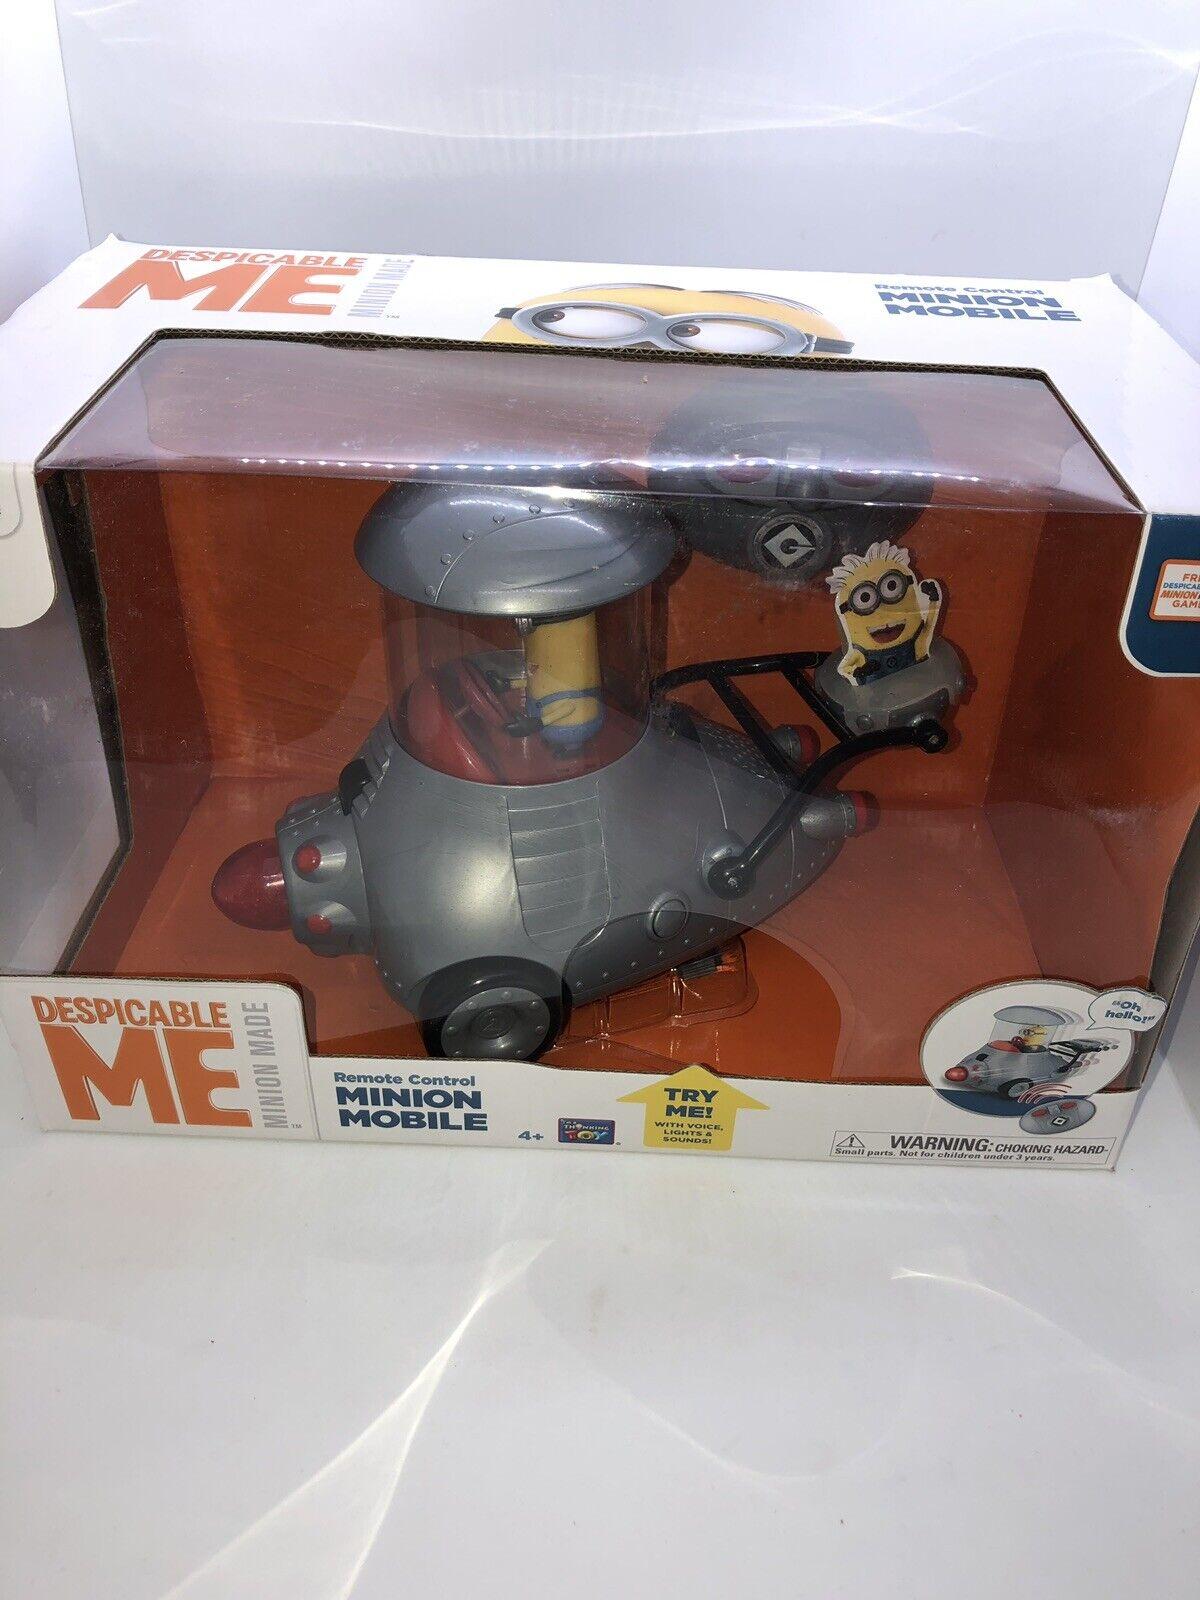 Rare Despicable Me 2 Remote Control Minion Mobile Thinkway Toys RC Car MIB